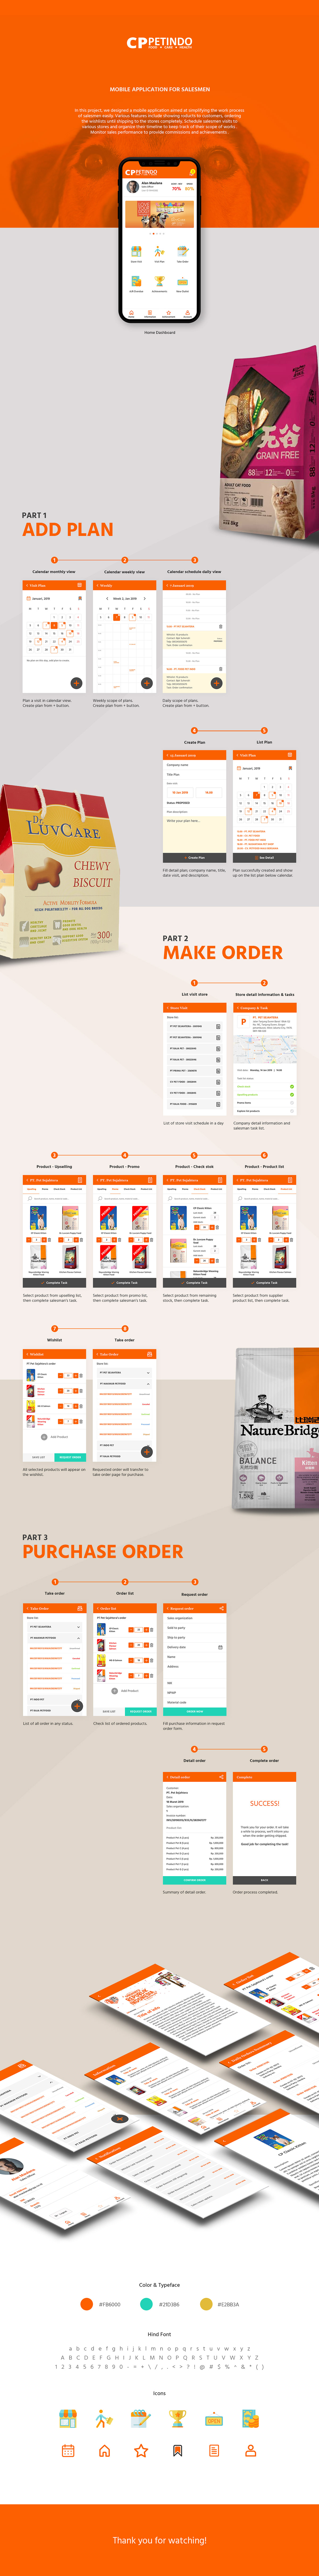 application Pet orange sales Food  store schedule task app warehouse